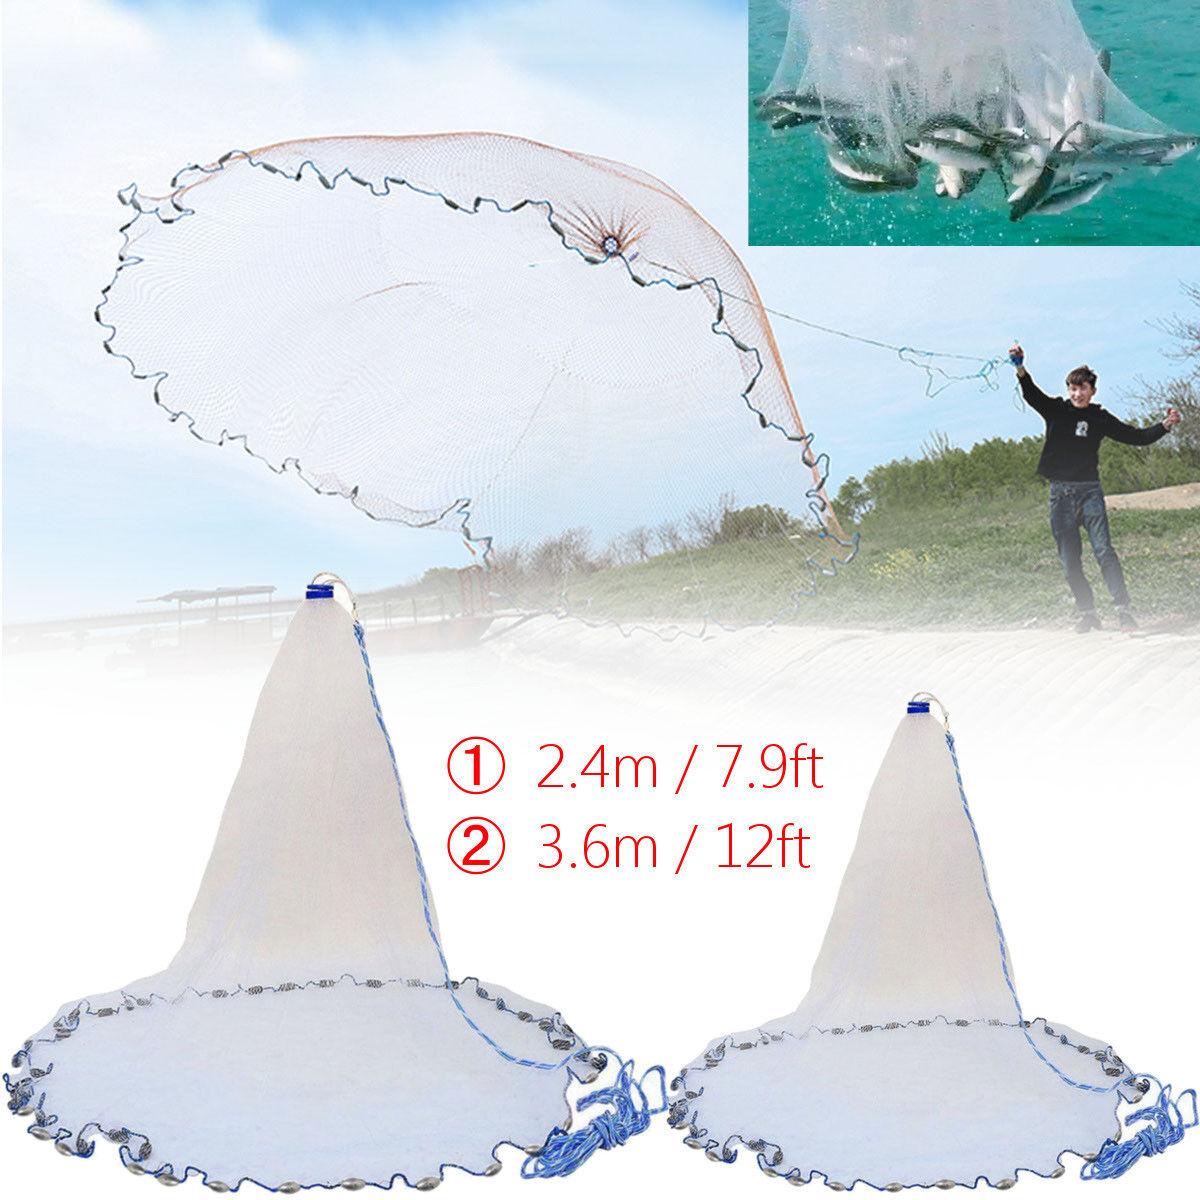 Nylon 12 7.9ft Mono Drawstring Cast Net Spread Fishing Live Bait Net Hand Cast